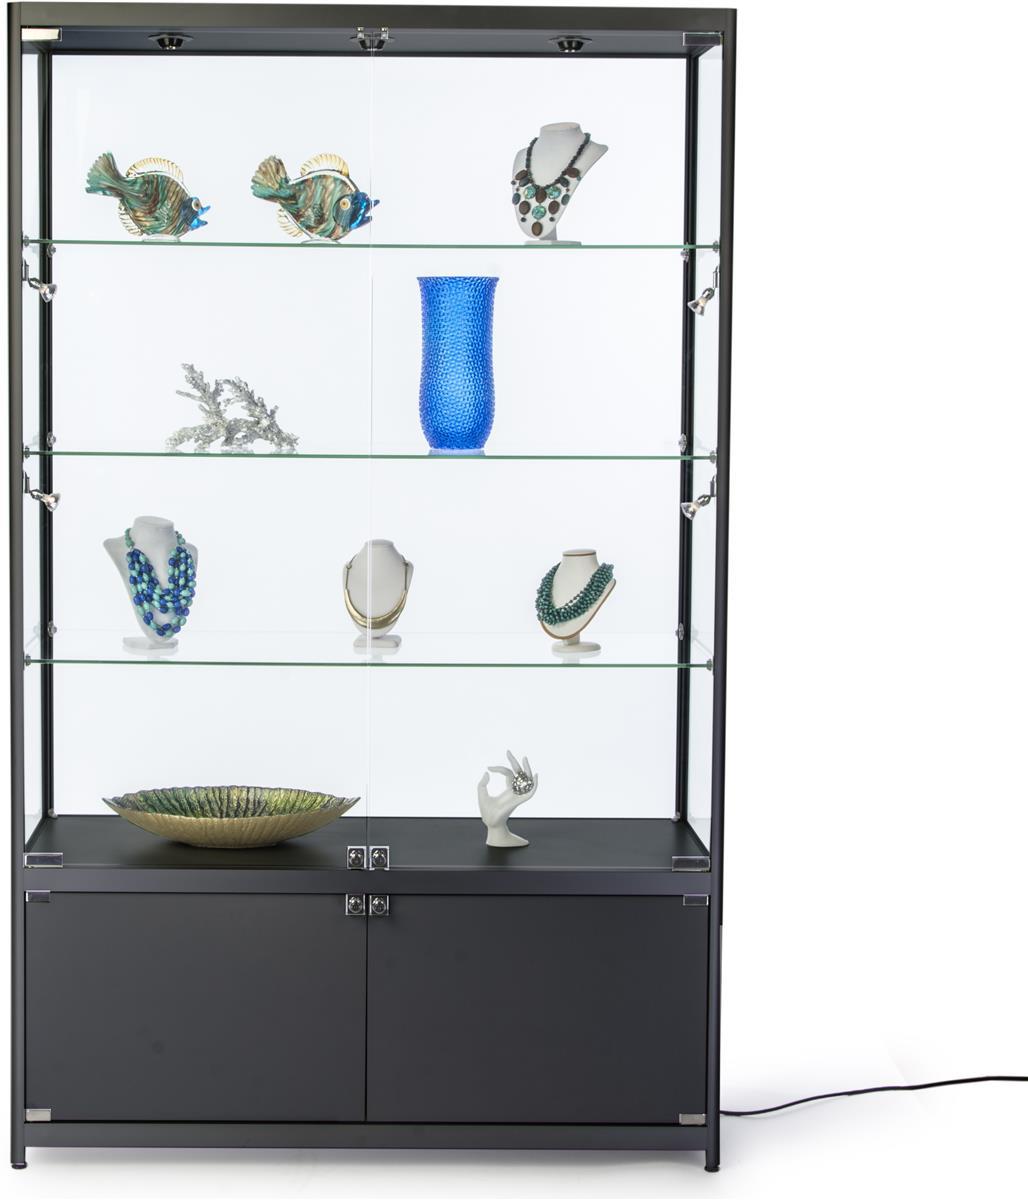 Led Glass Cabinet Shelf Light: LED Retail Display Cabinet